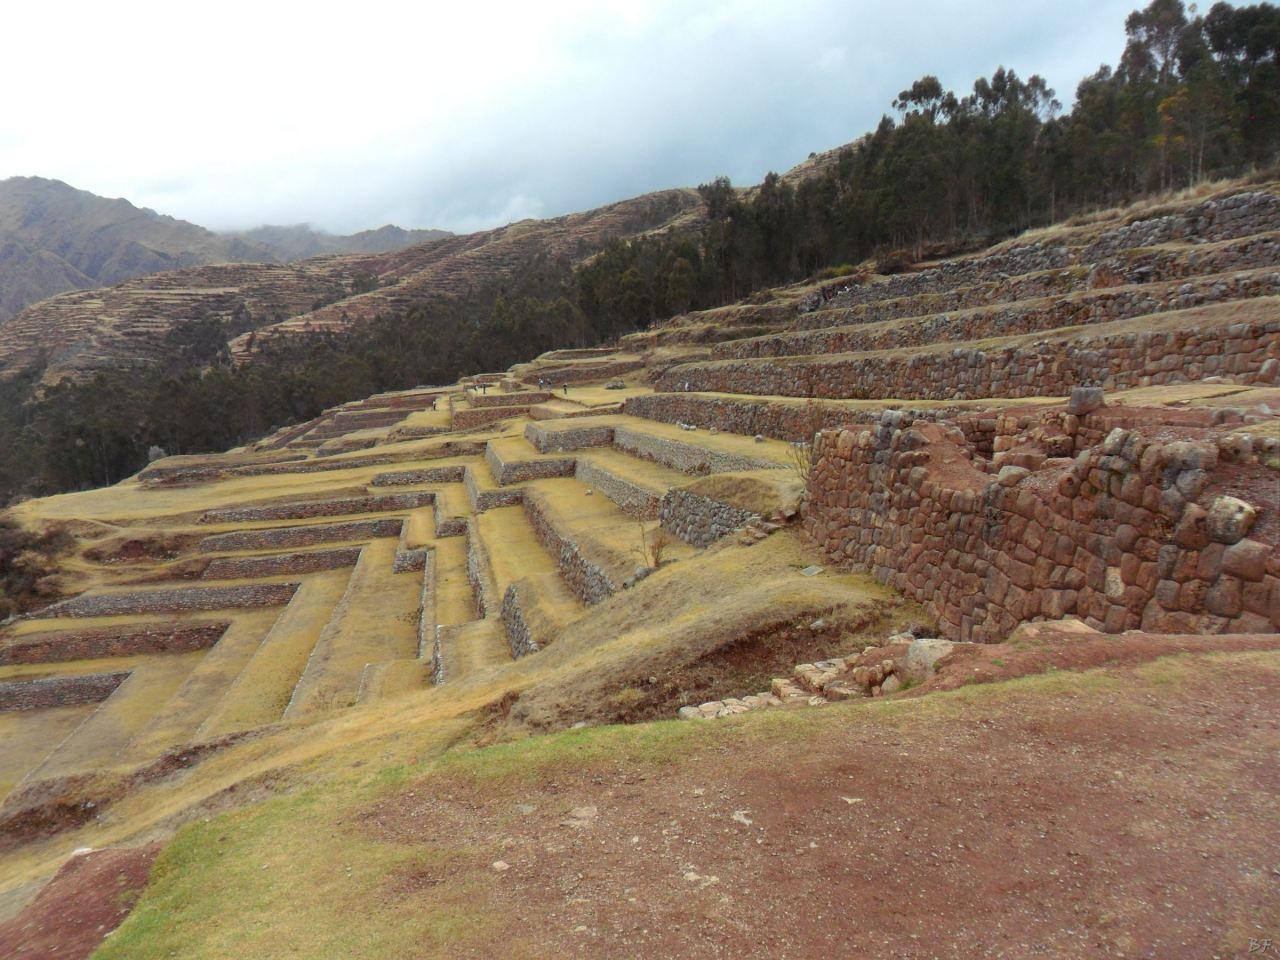 Chinchero-Mura-Poligonali-Piramide-Urubamba-Peru-40